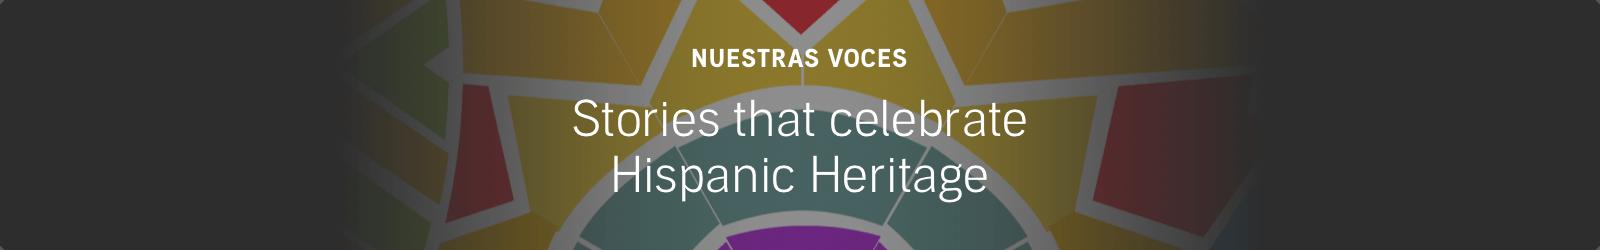 Nuestras Voces. Stories that celebrate Hispanic Heritage.